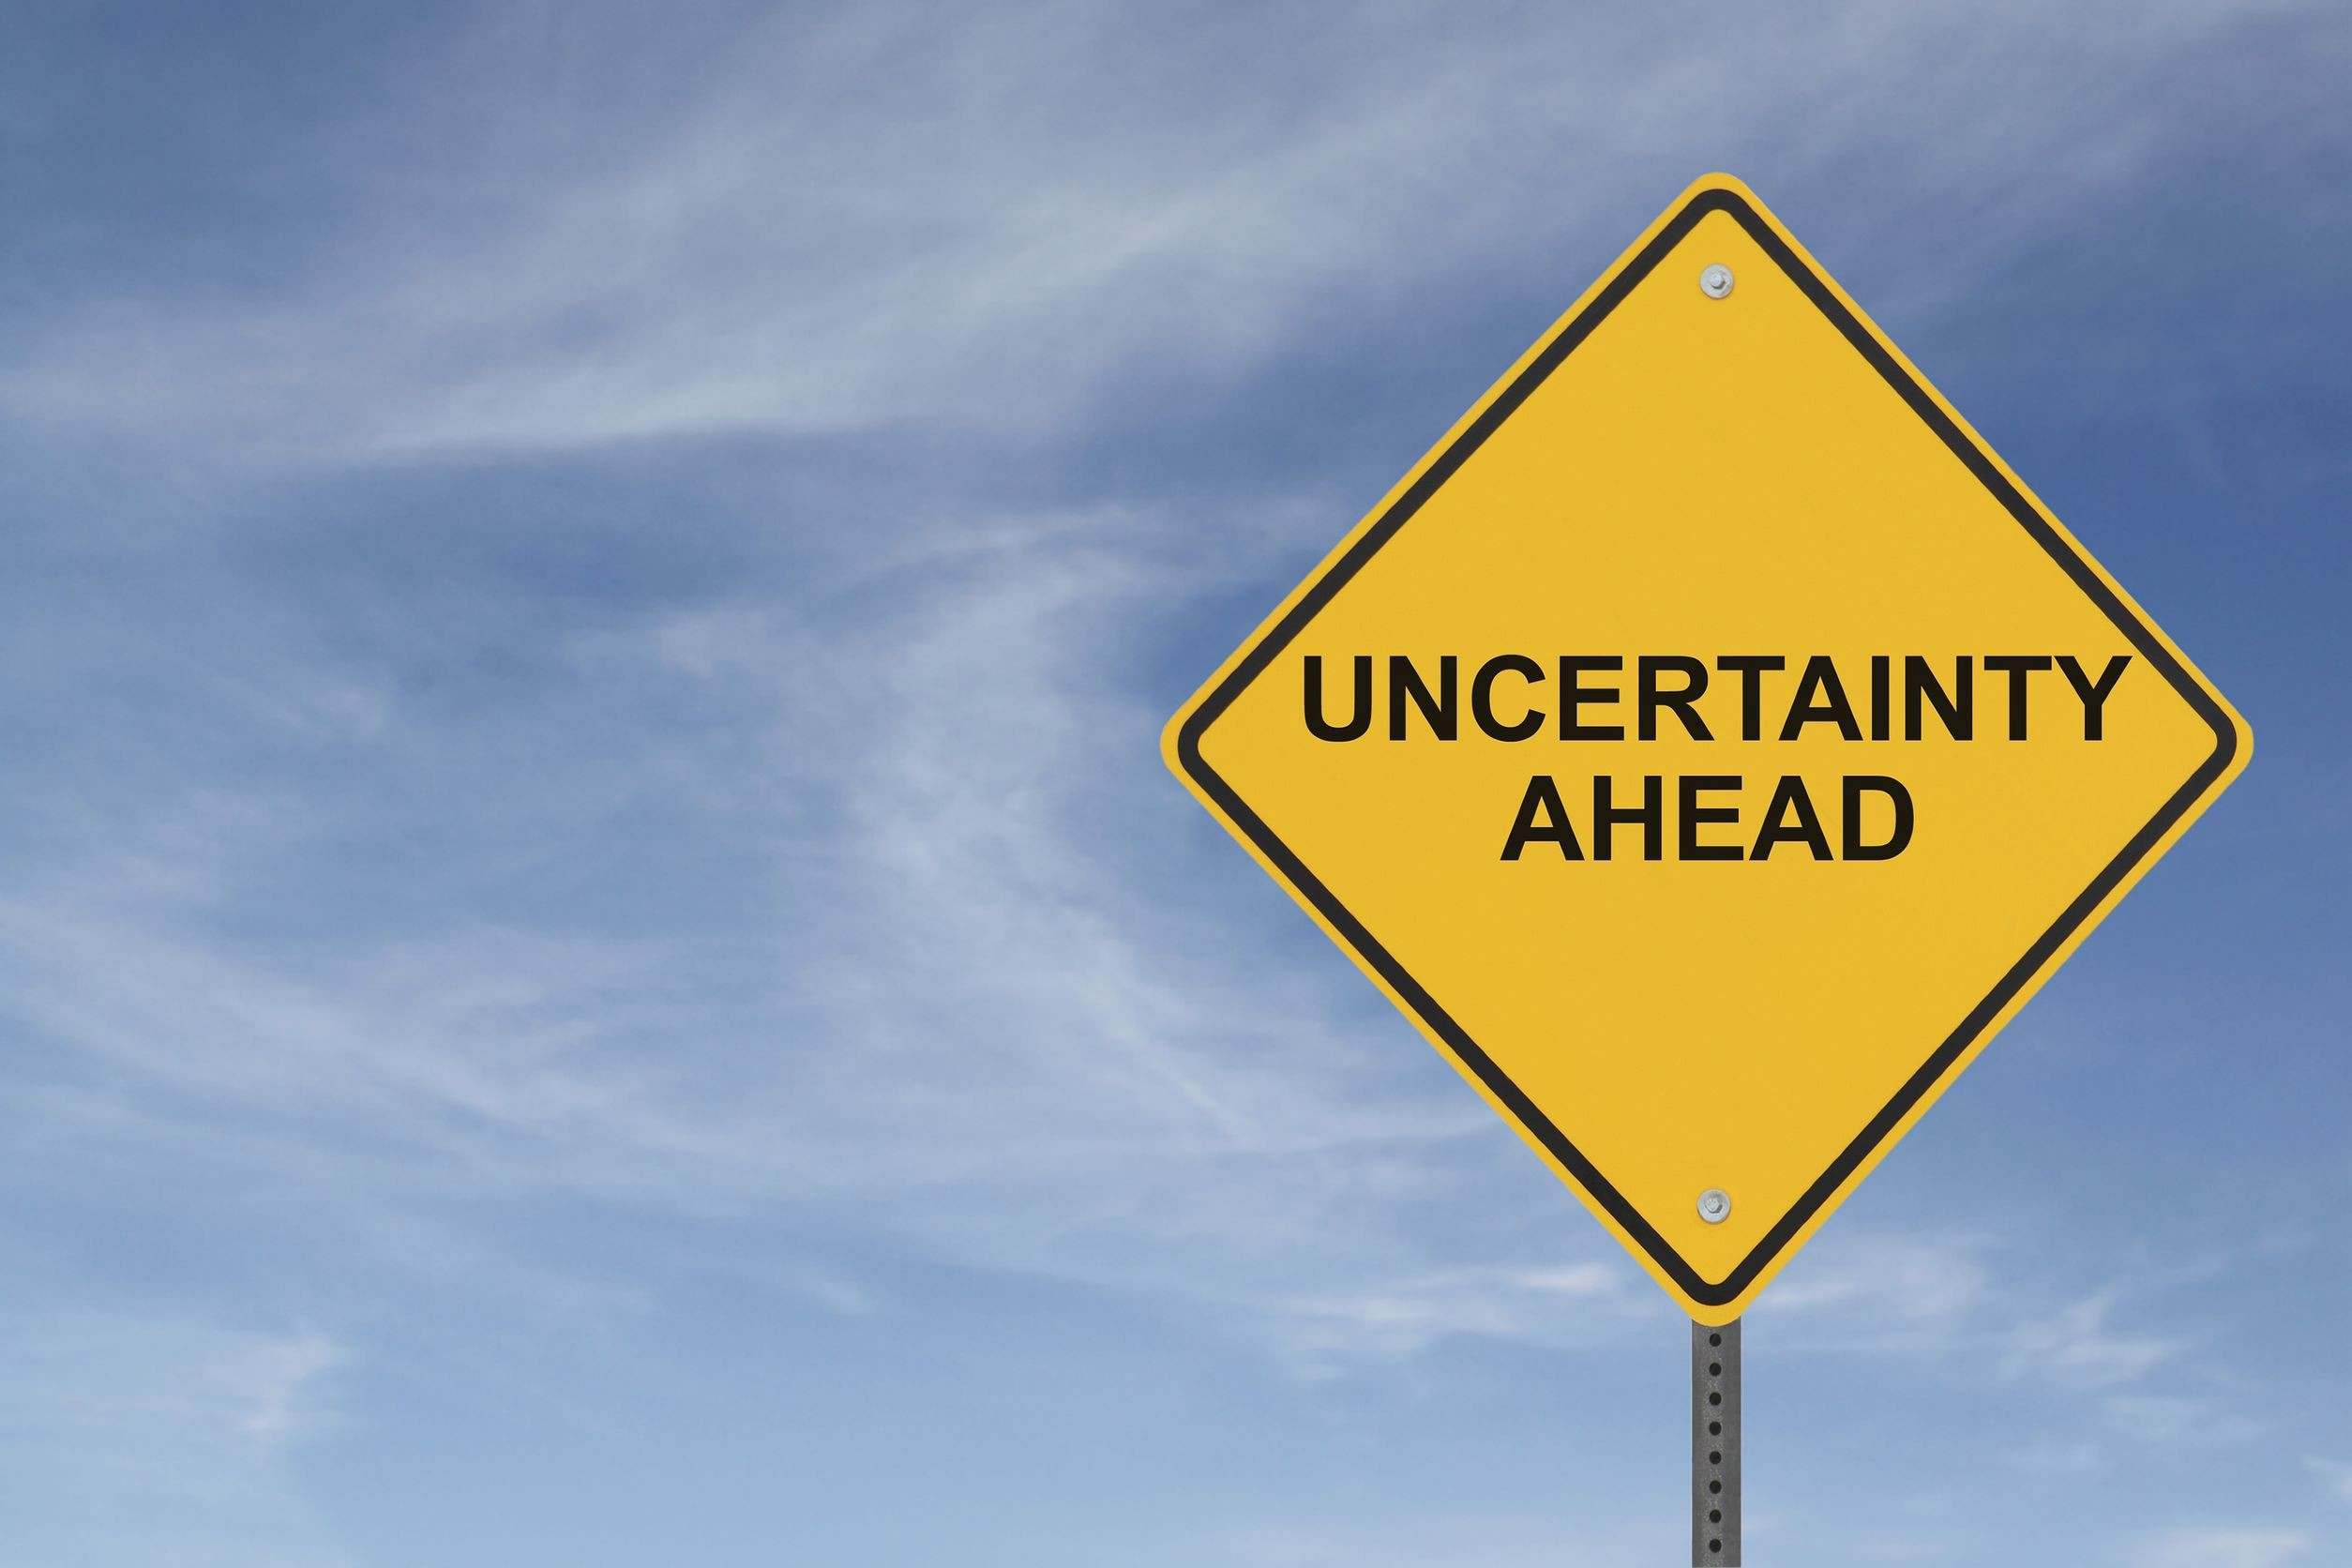 Uncertainty vs Certainty